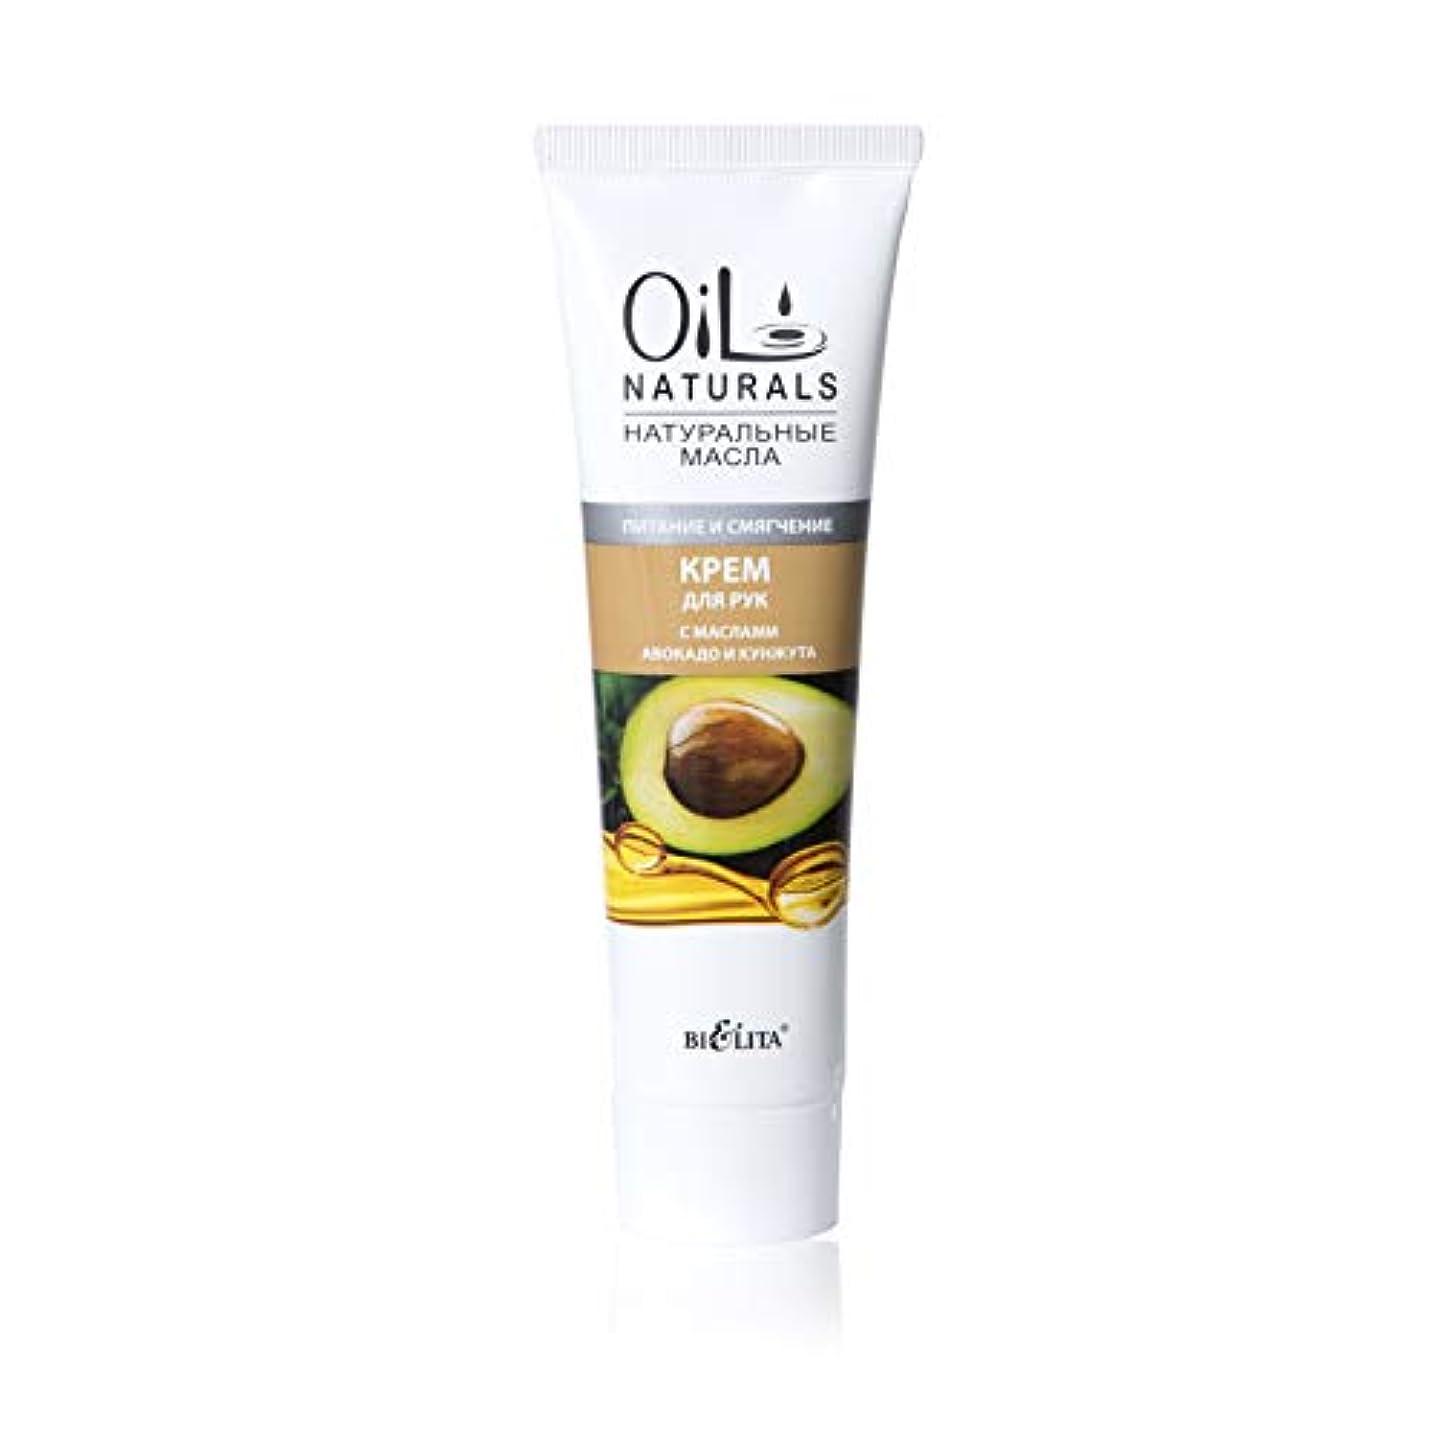 Bielita & Vitex Oil Naturals Line | Nutrition & Softening Hand Cream, 100 ml | Avocado Oil, Silk Proteins, Sesame...